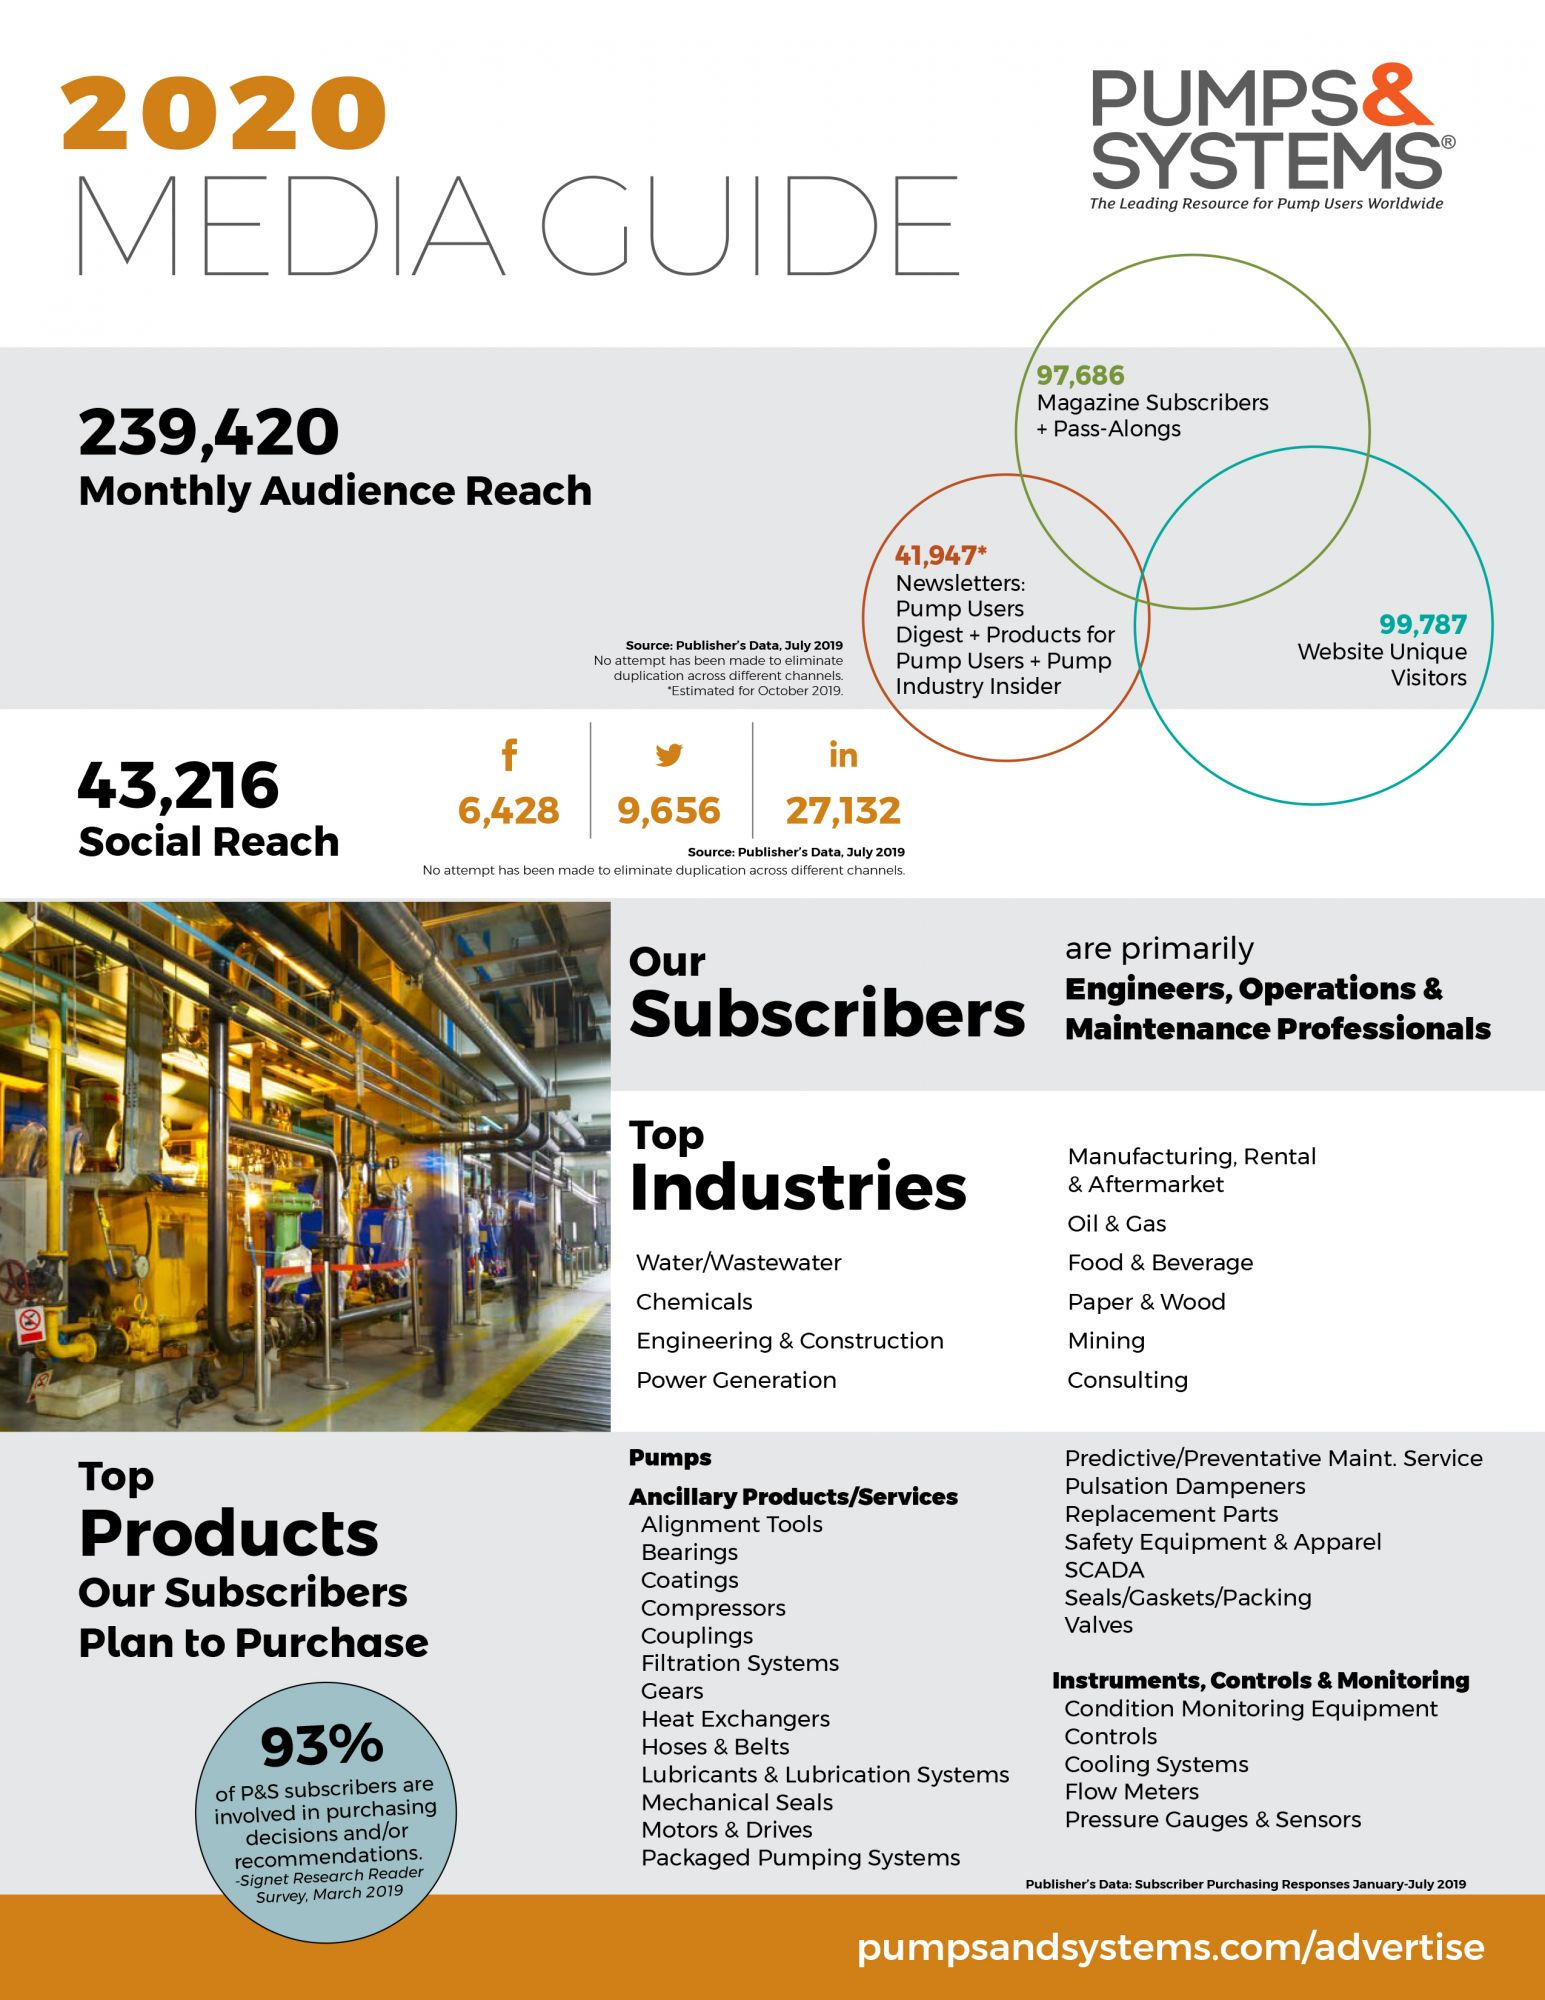 Media Guide 2020 cover